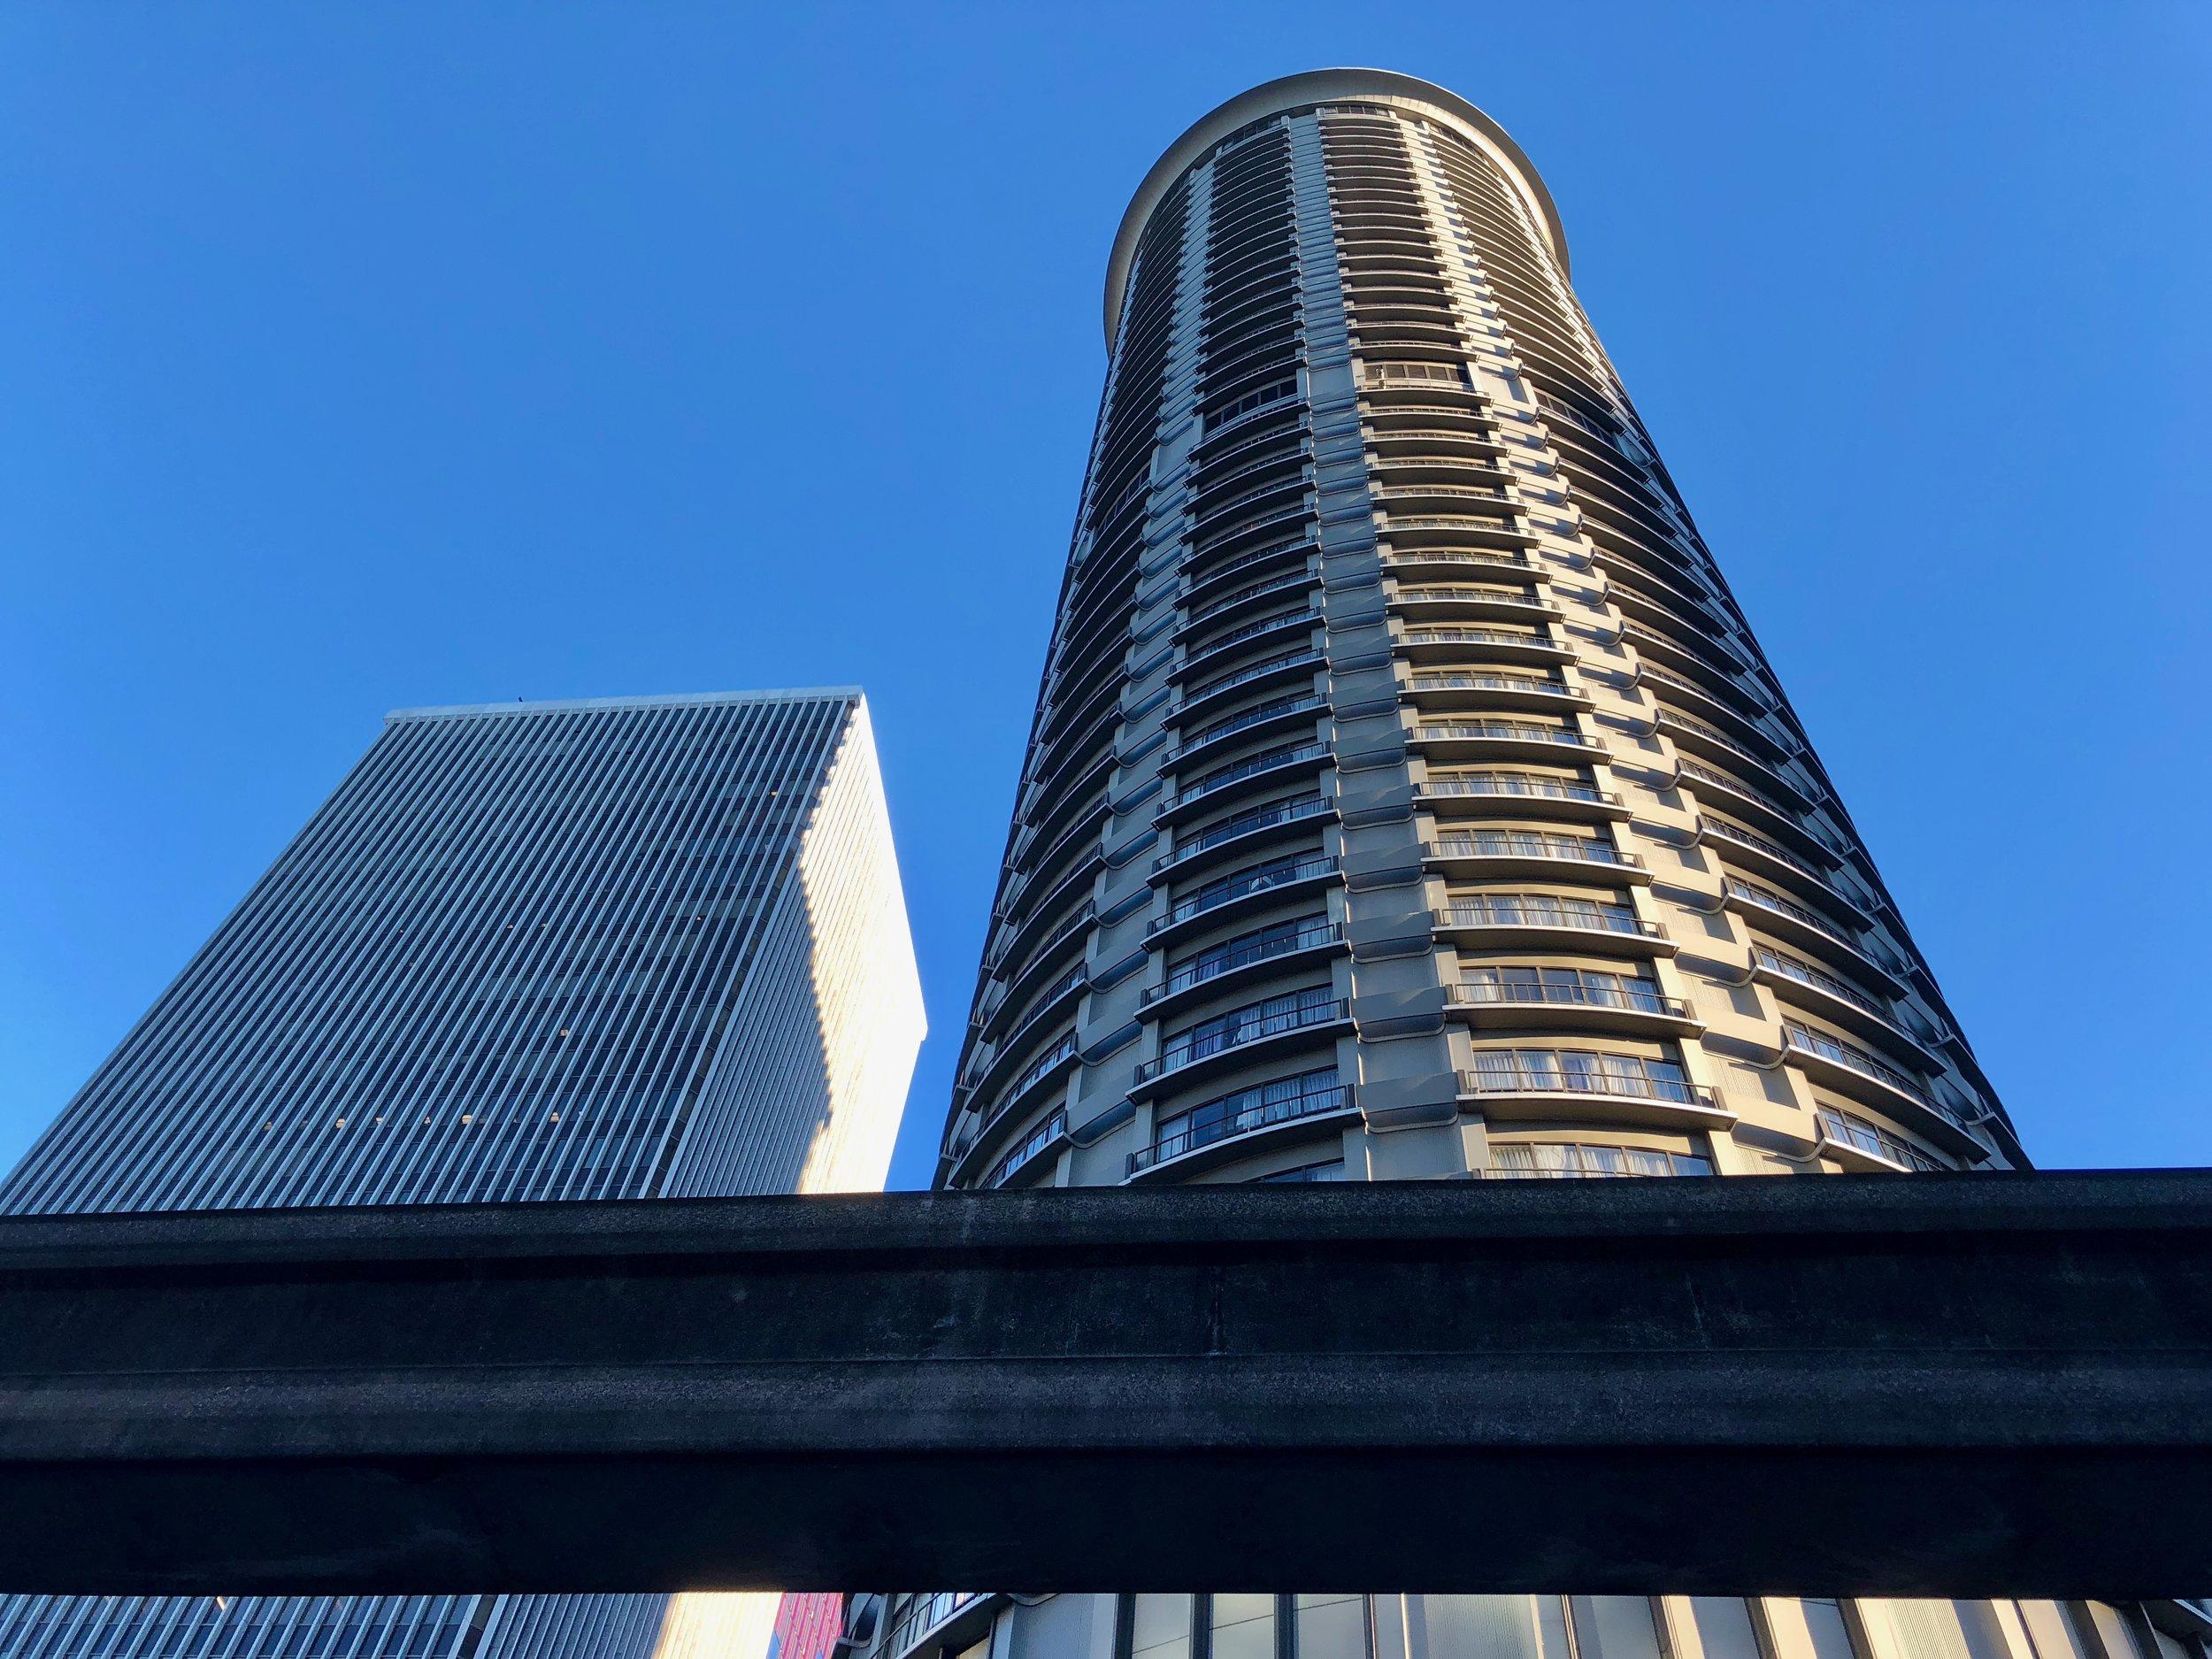 Seattle Hotel - iPhone X